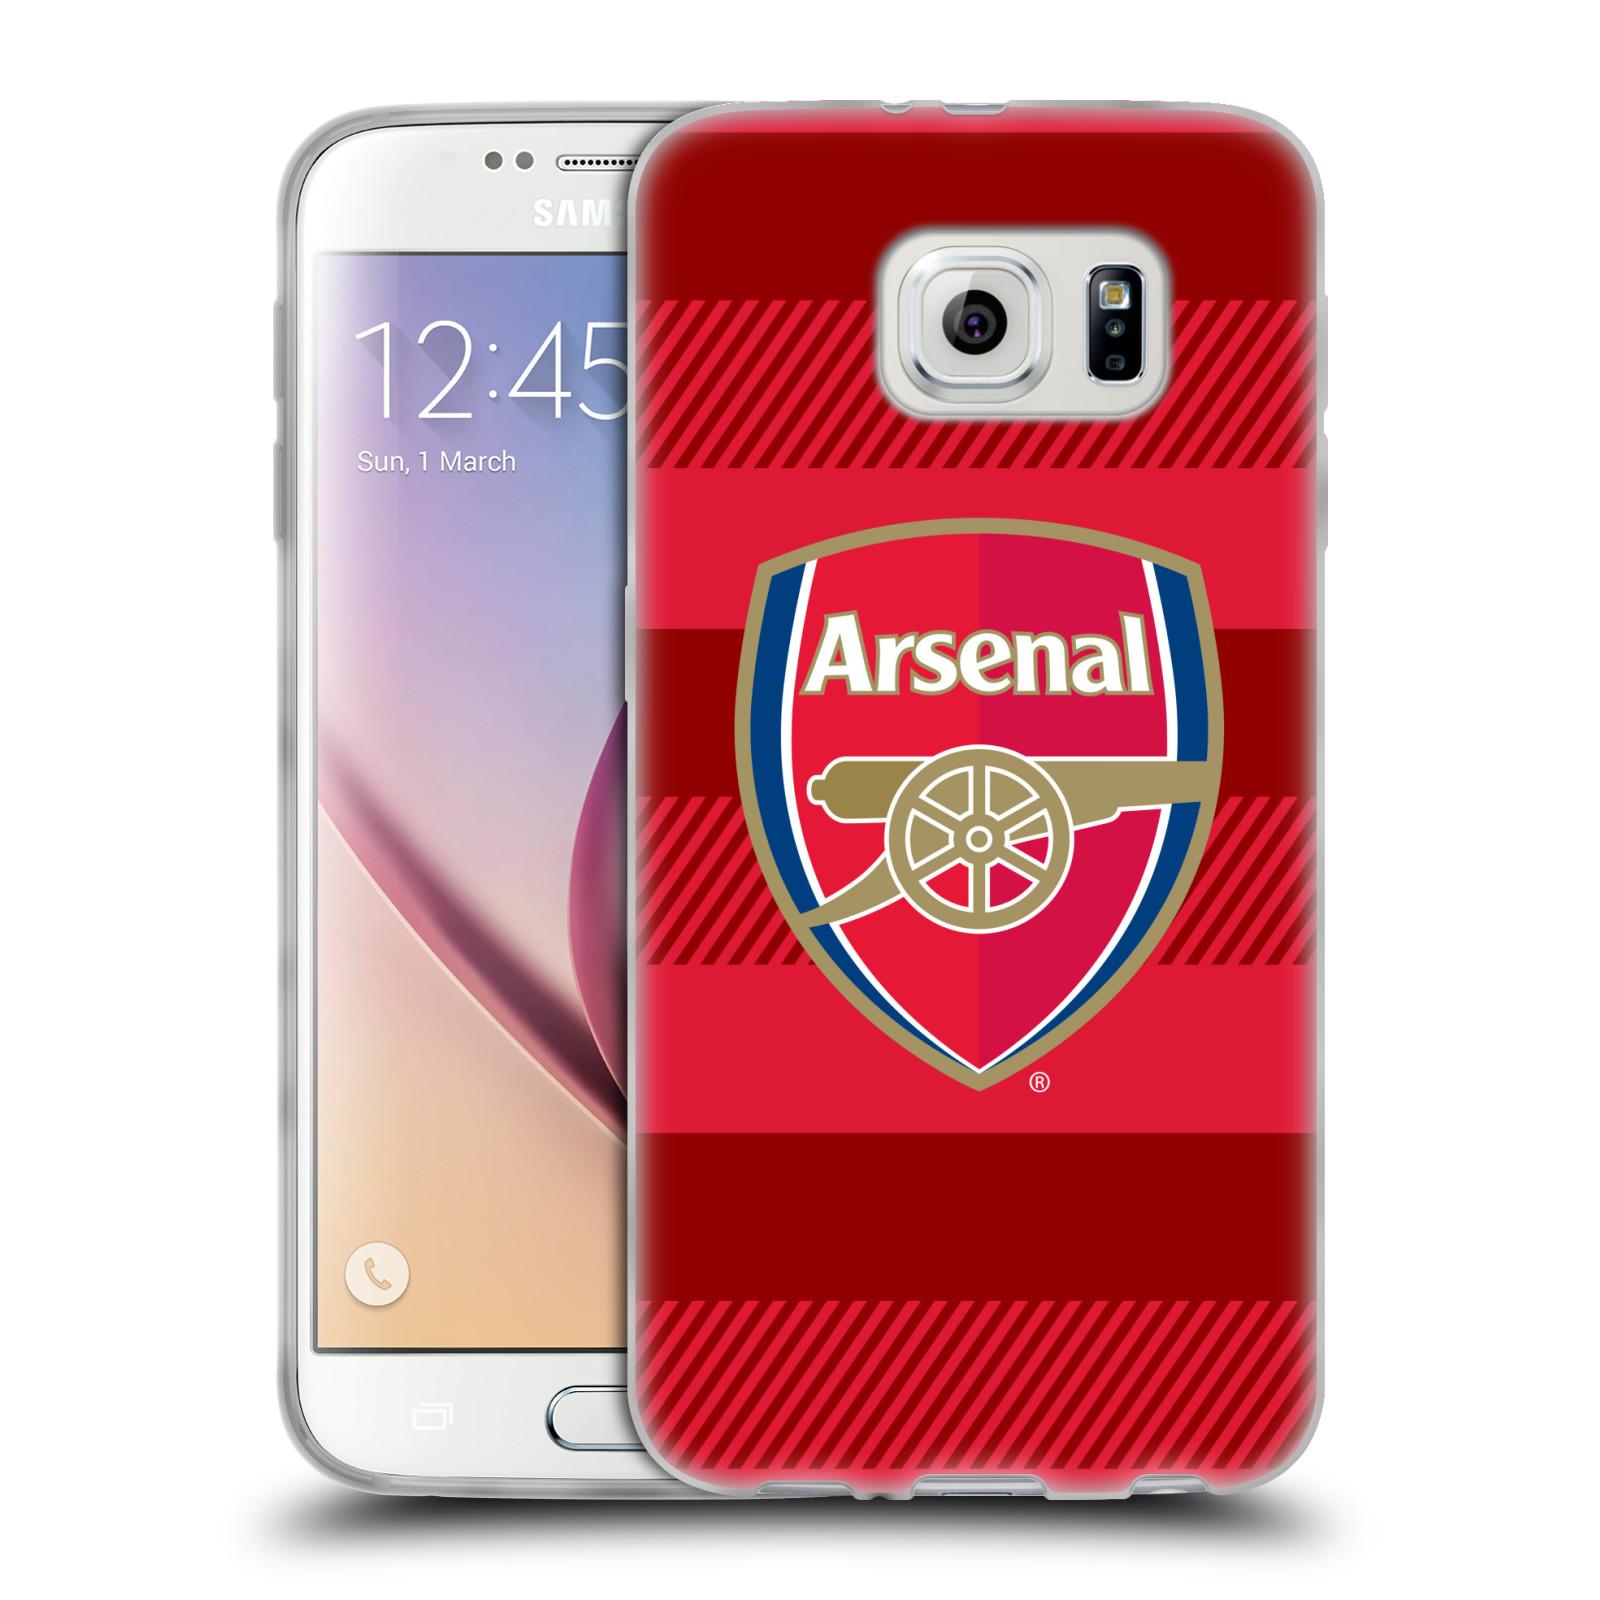 Silikonové pouzdro na mobil Samsung Galaxy S6 - Head Case - Arsenal FC - Logo s pruhy